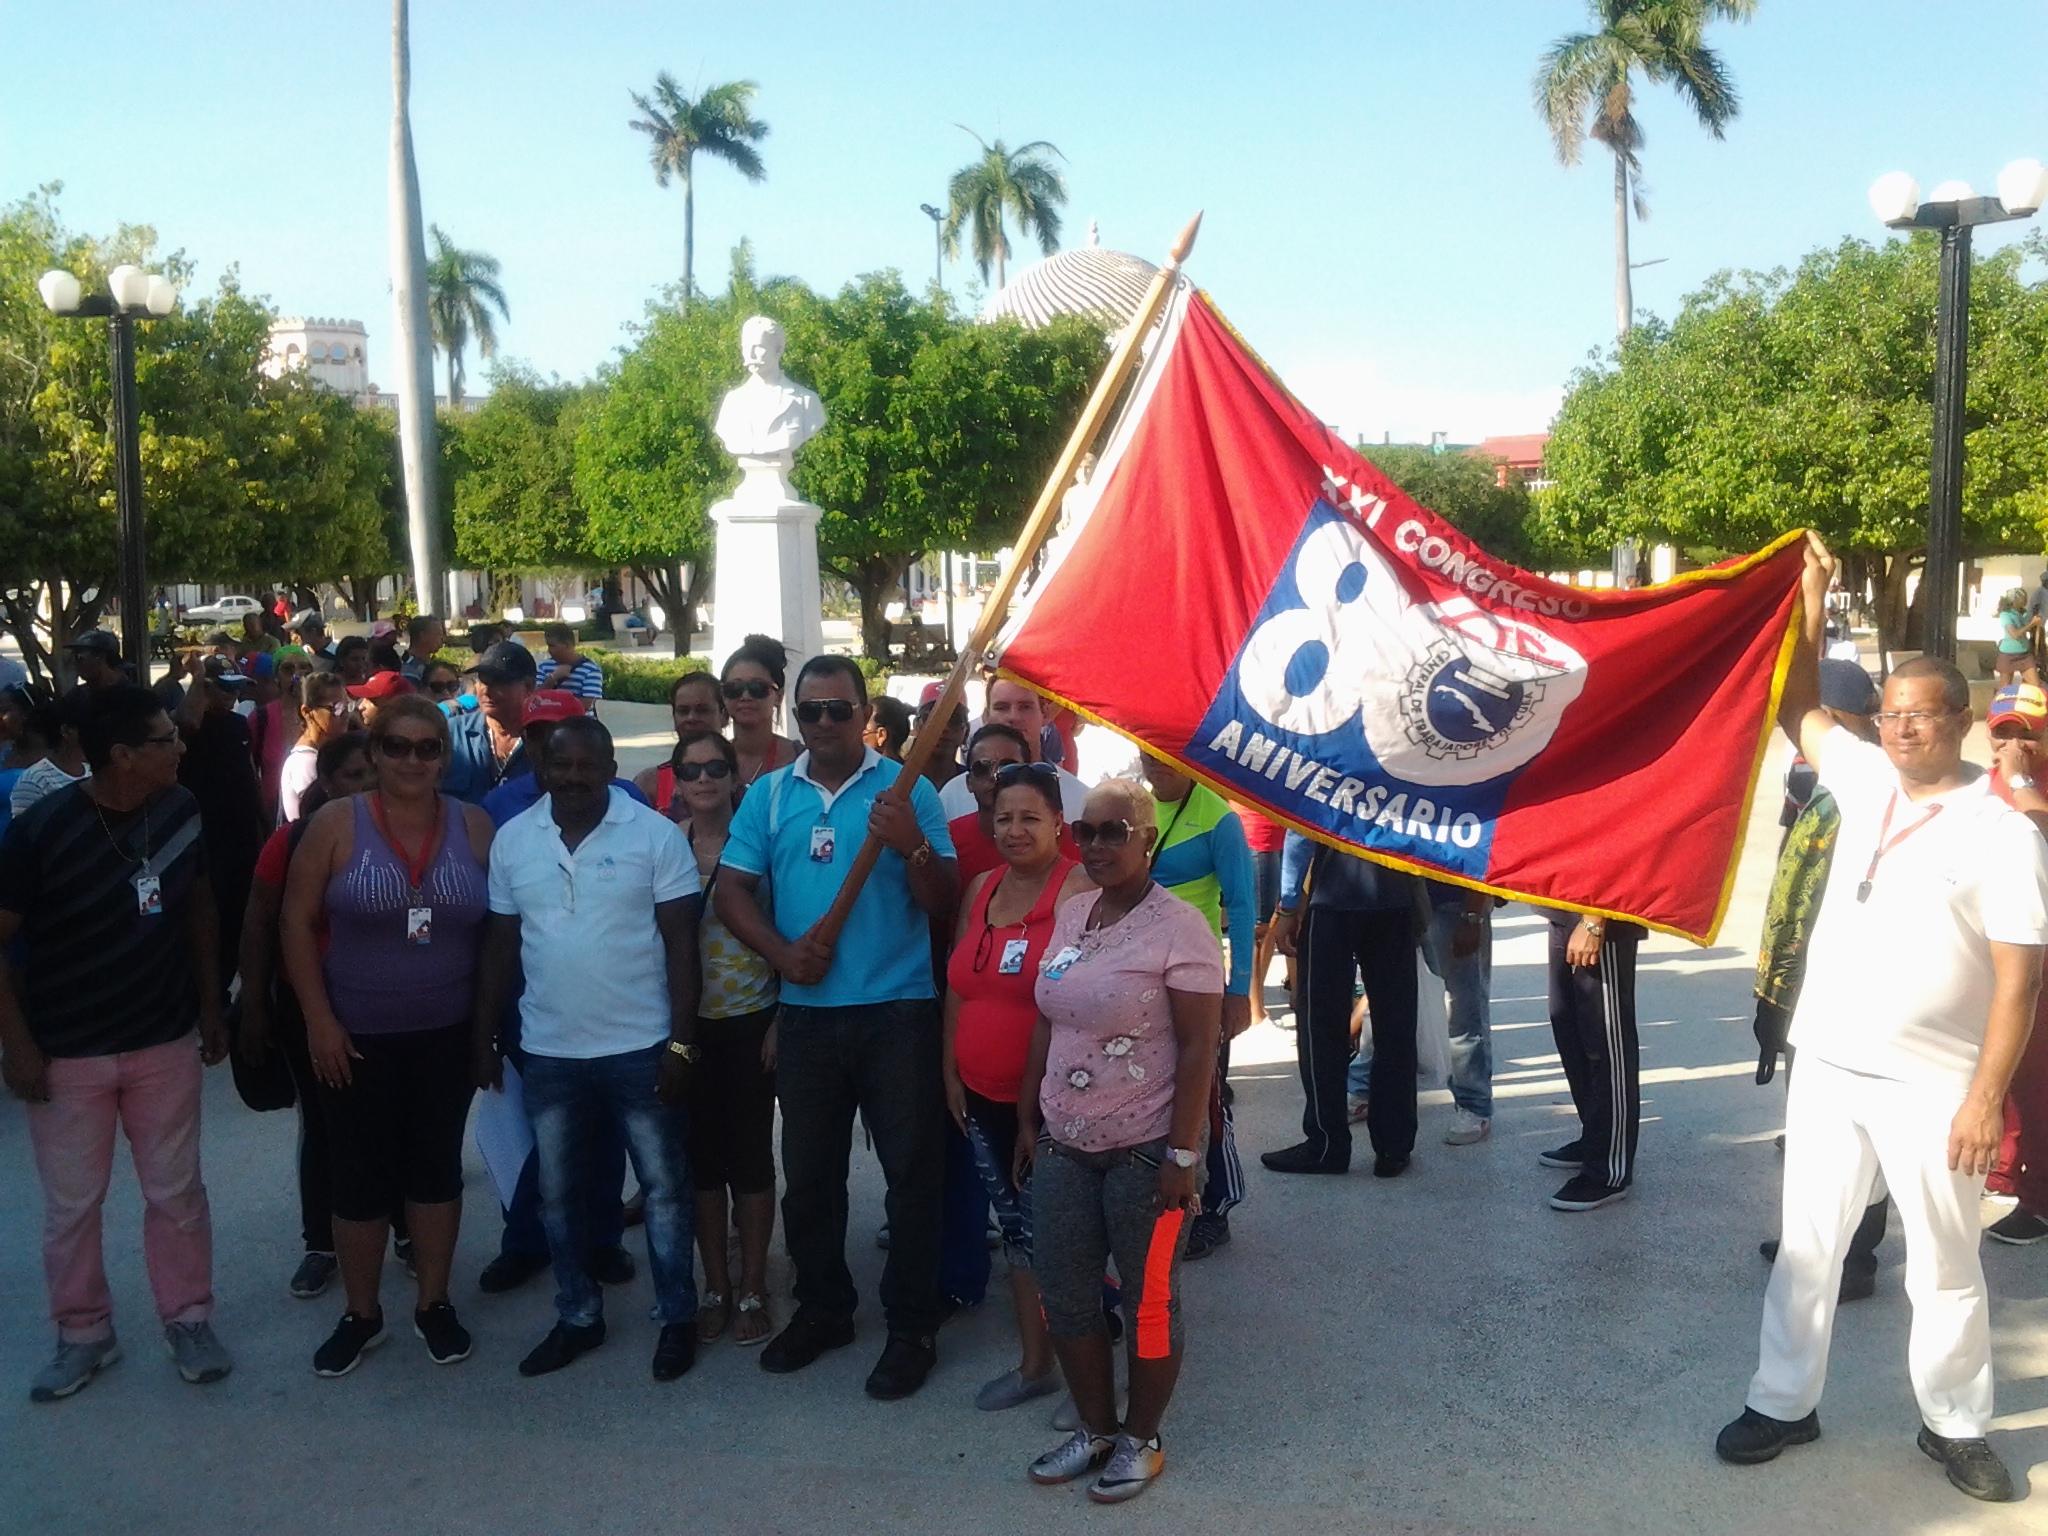 Trabajadores de Manzanillo reciben estandarte obrero